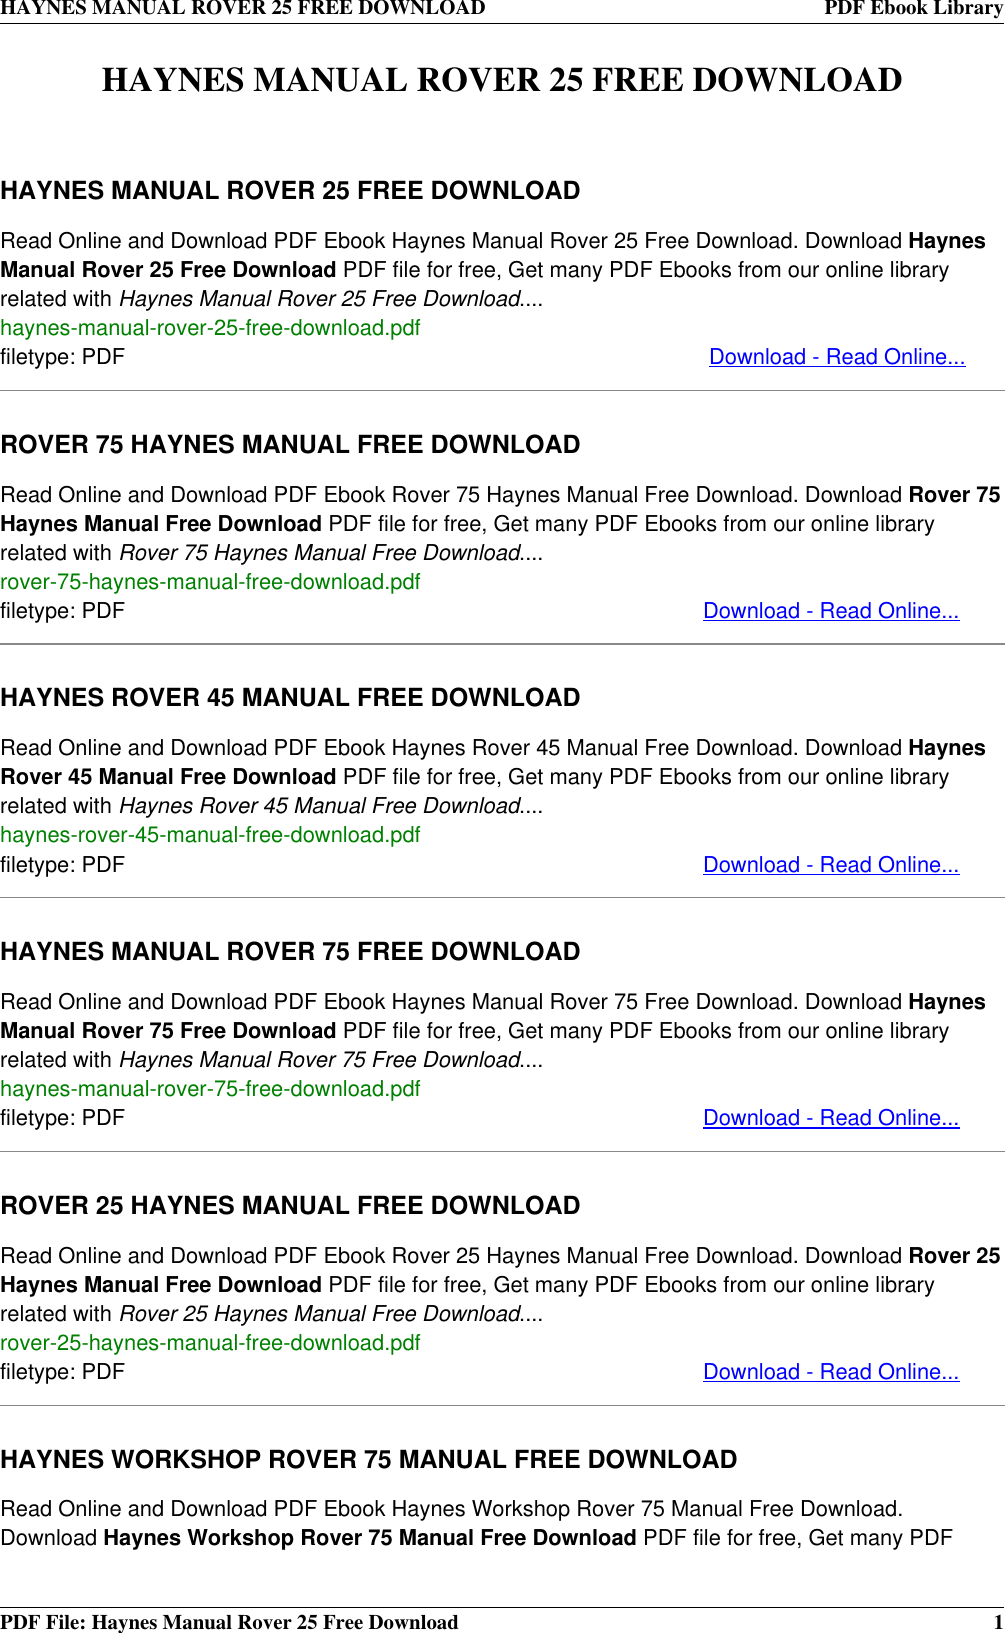 free haynes download